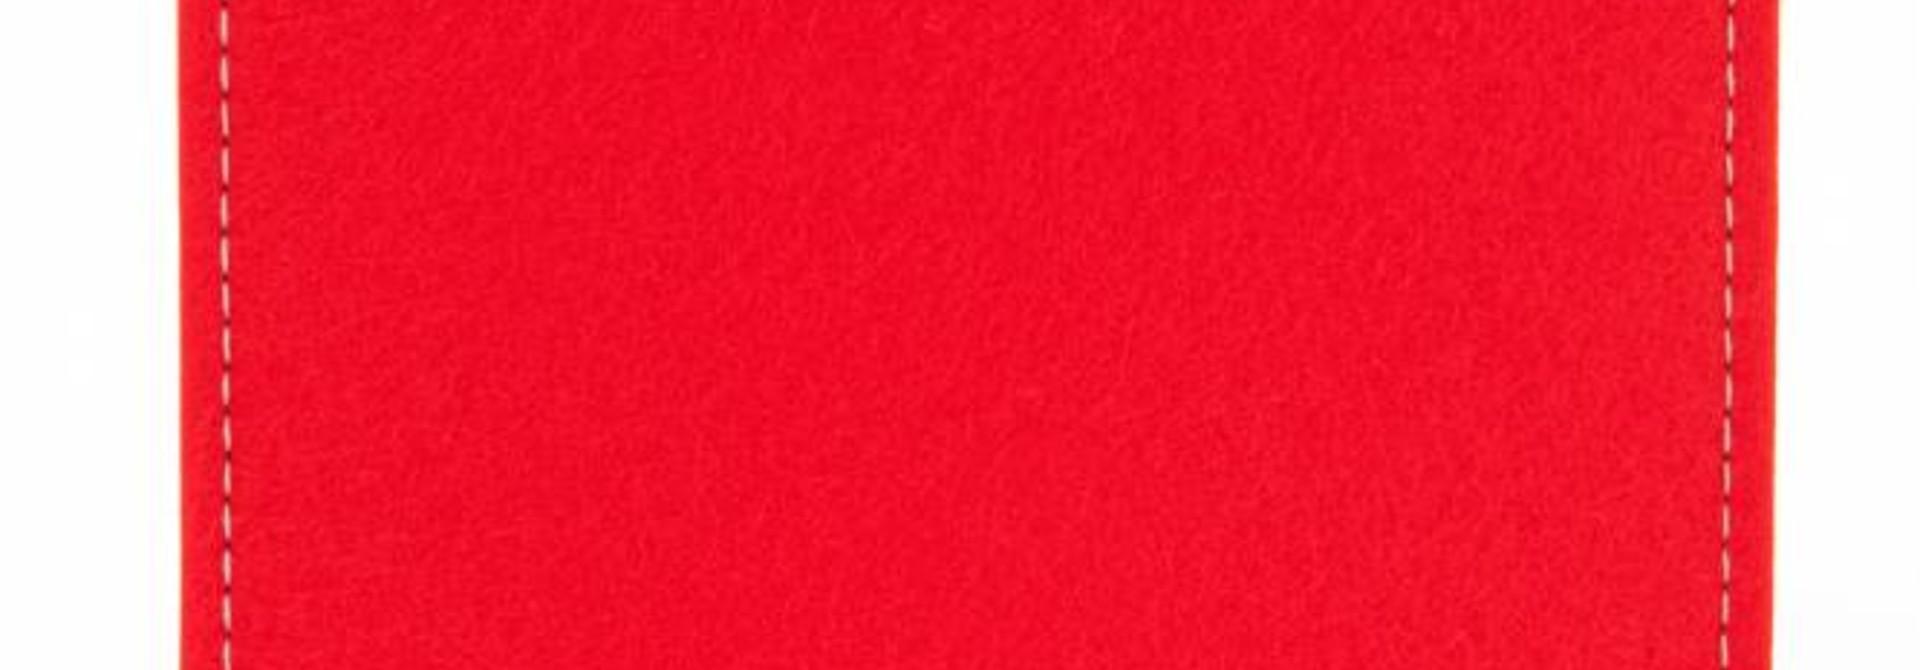 Intuos Sleeve Light-Red